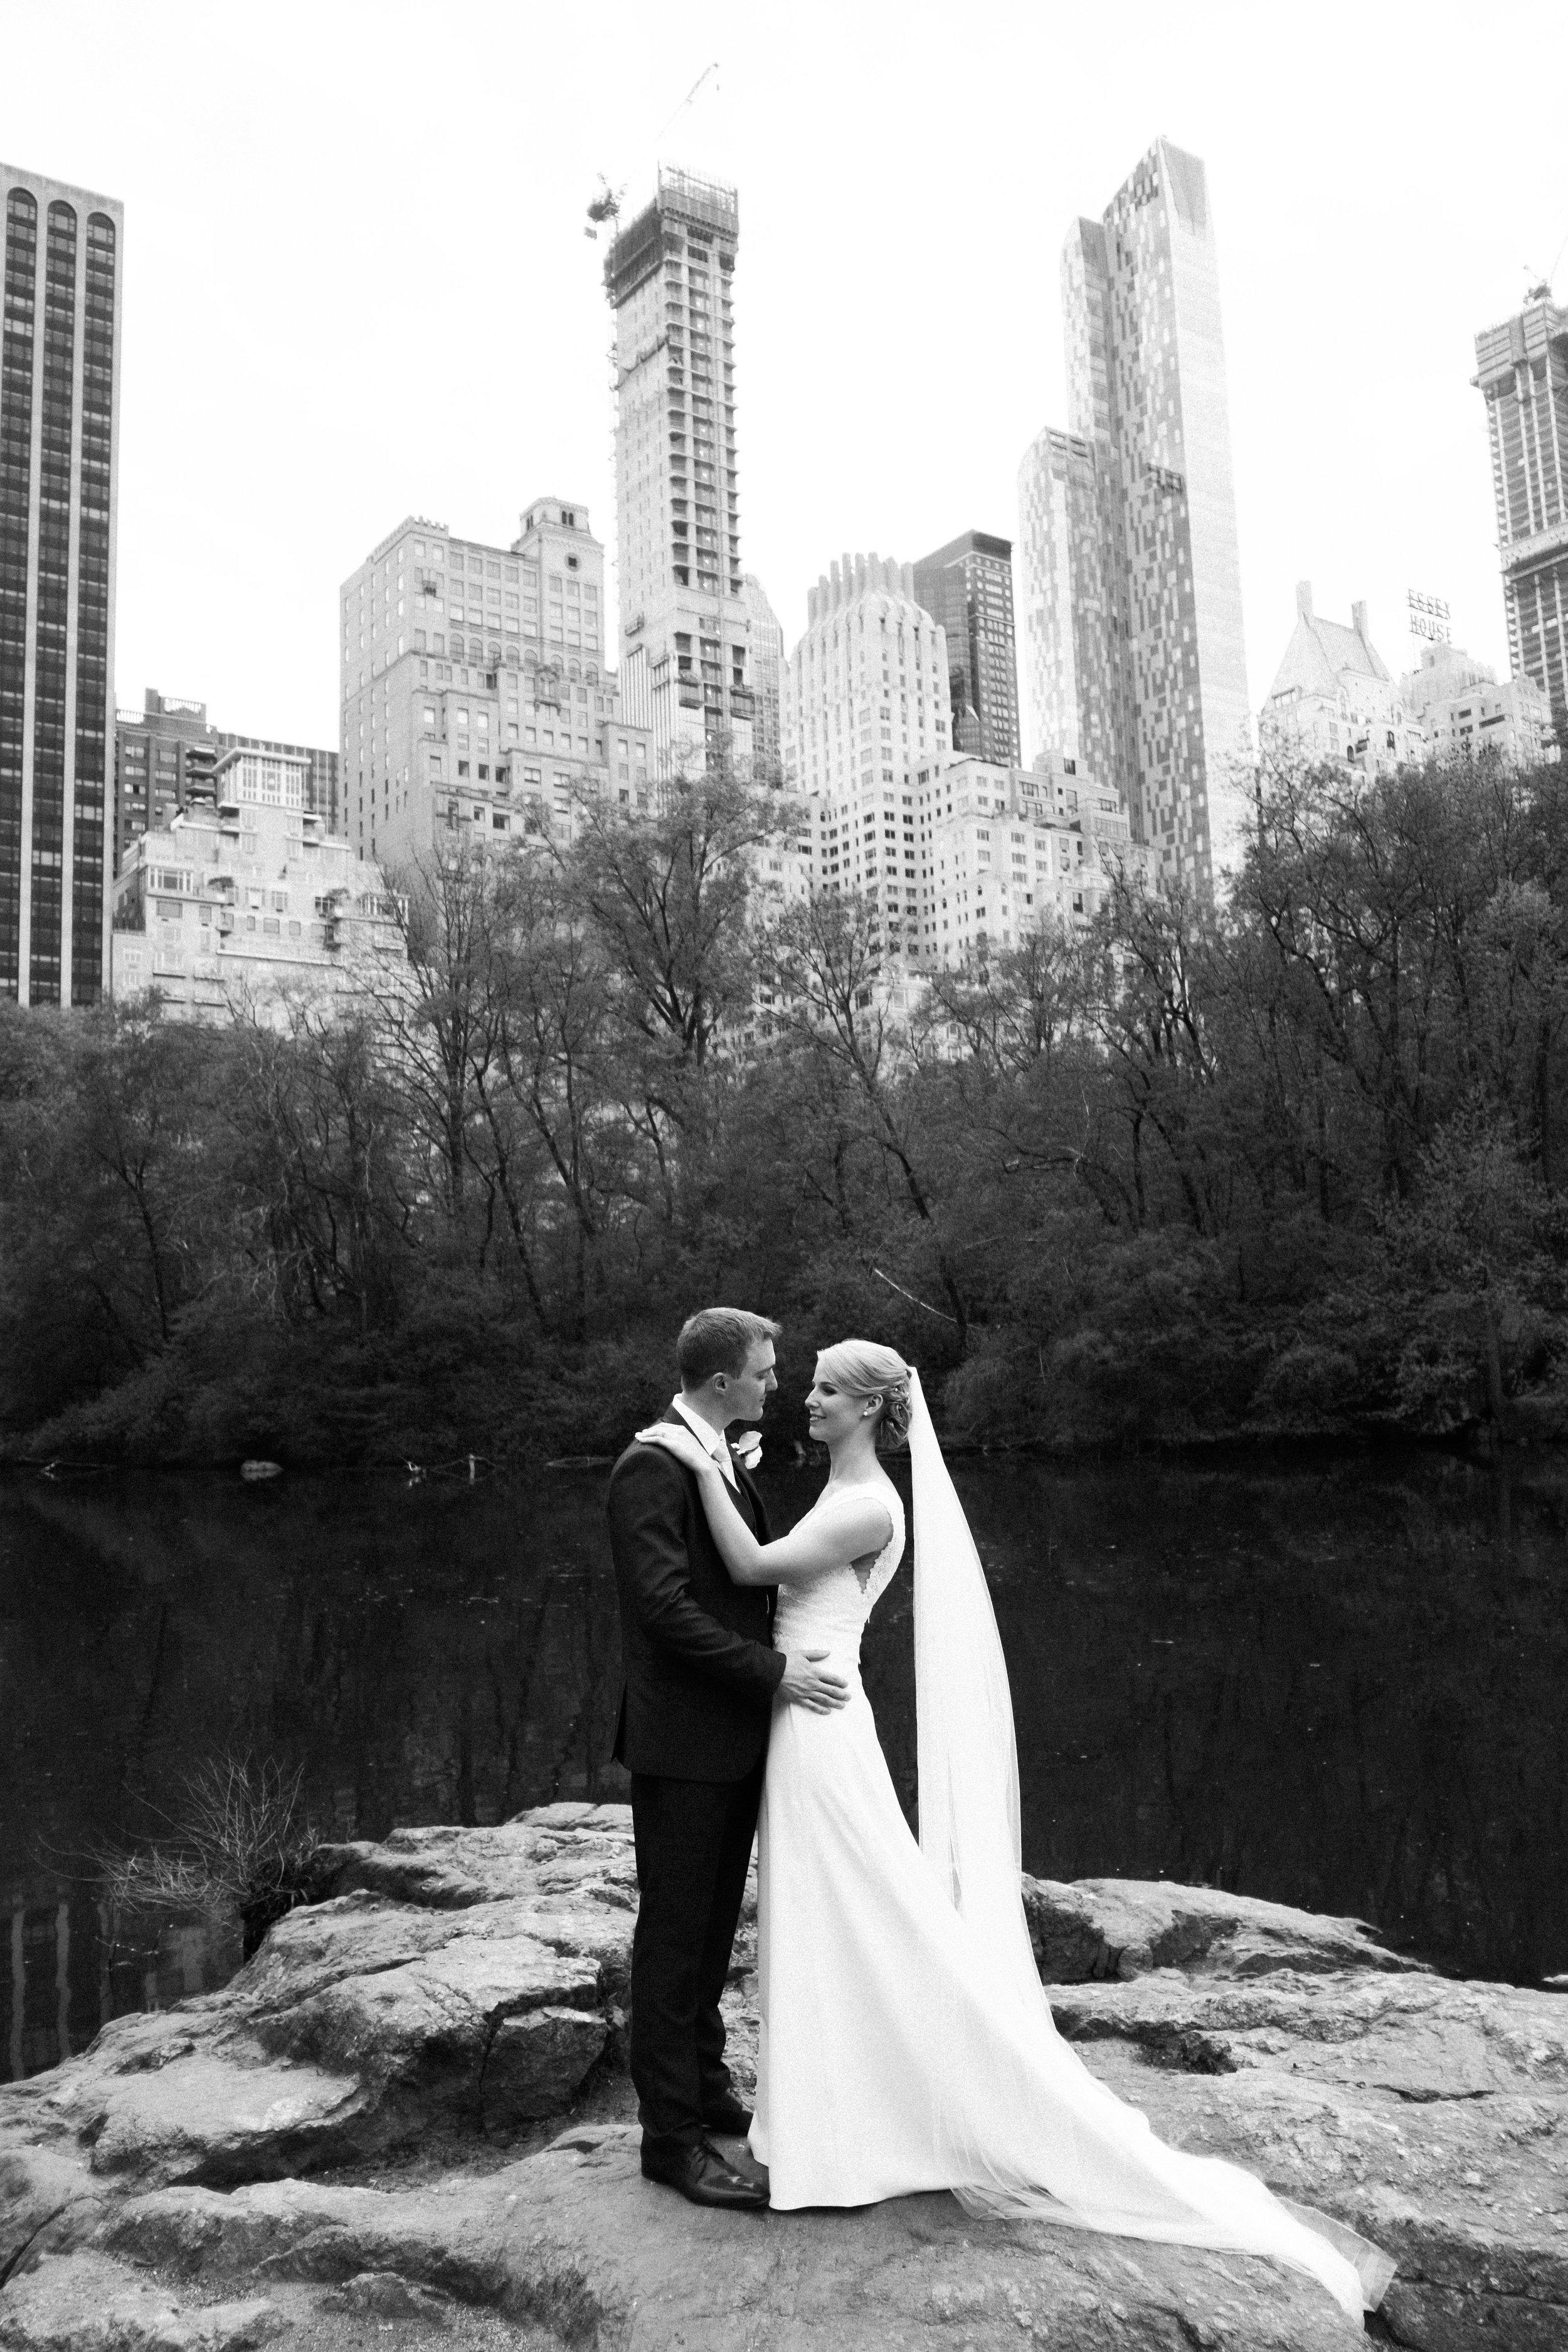 Central Park New York couples portraits